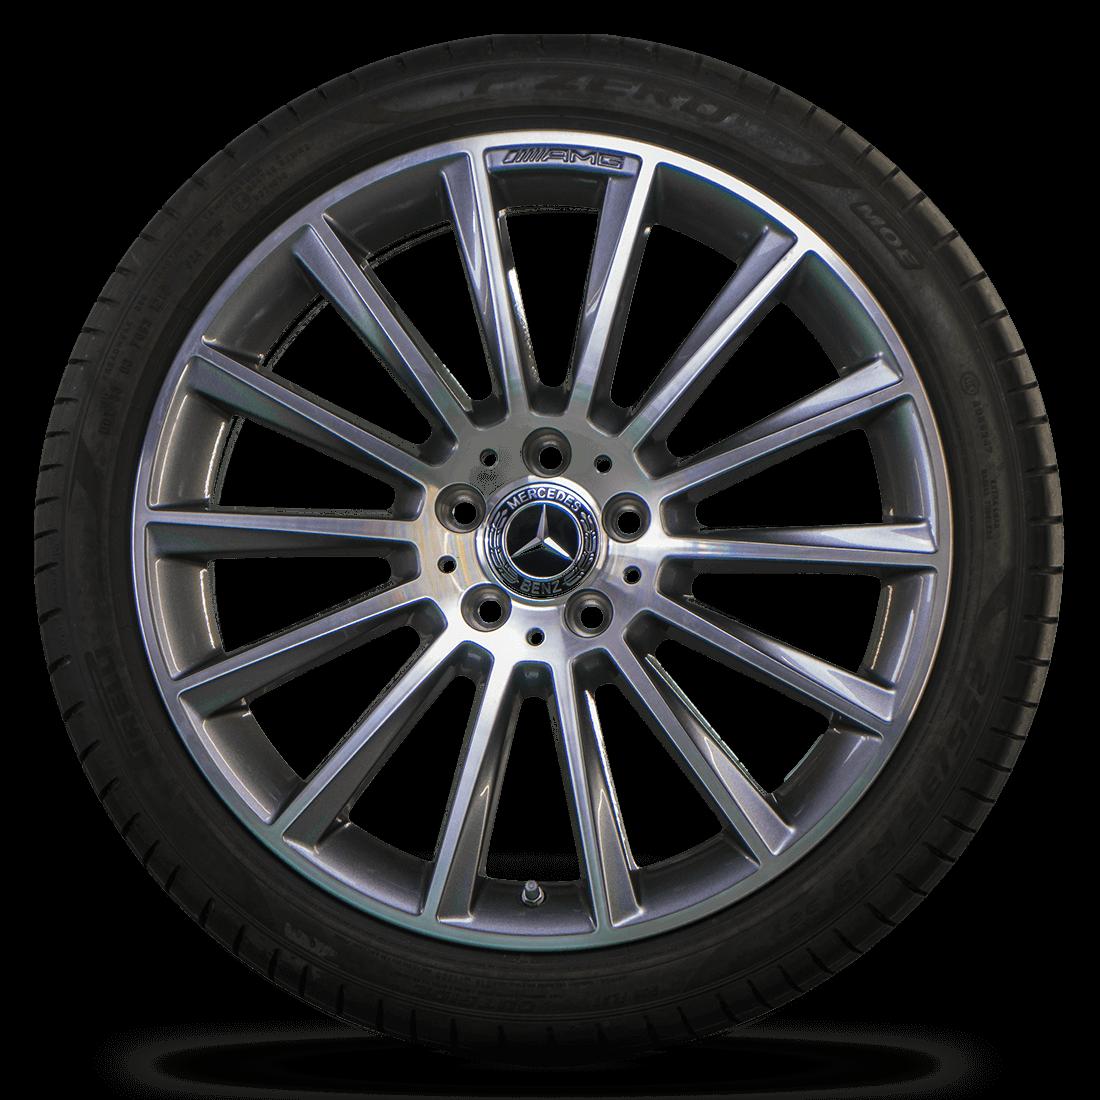 AMG 19 inch rims Mercedes Benz C-Class W205 S205 C205 aluminum rims summer tires